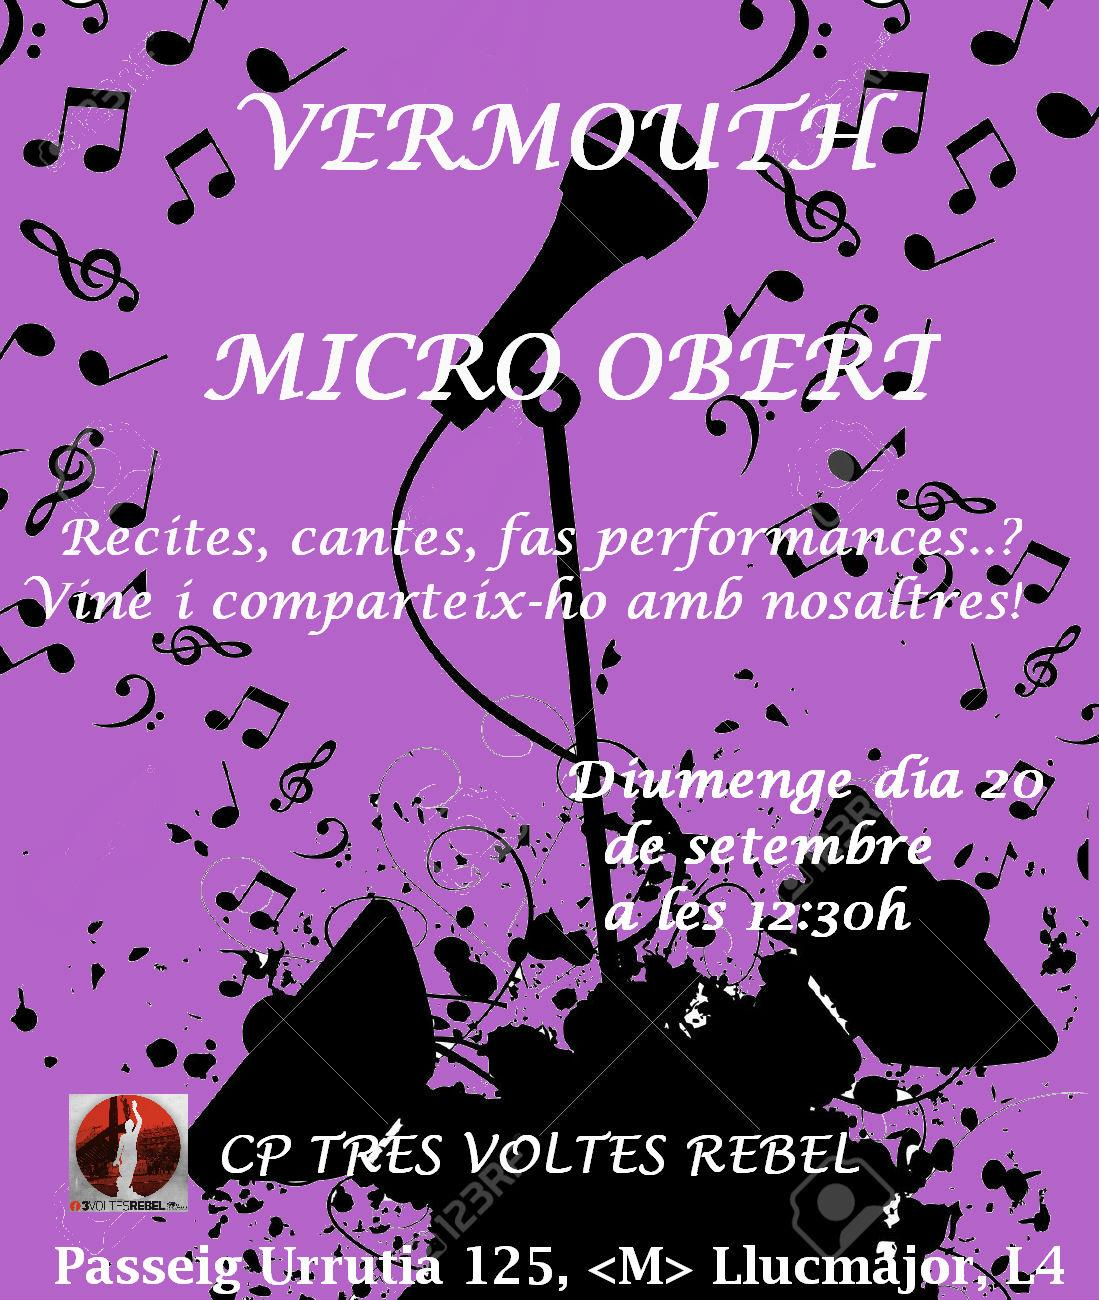 Vermouth Micro Obert definitiu